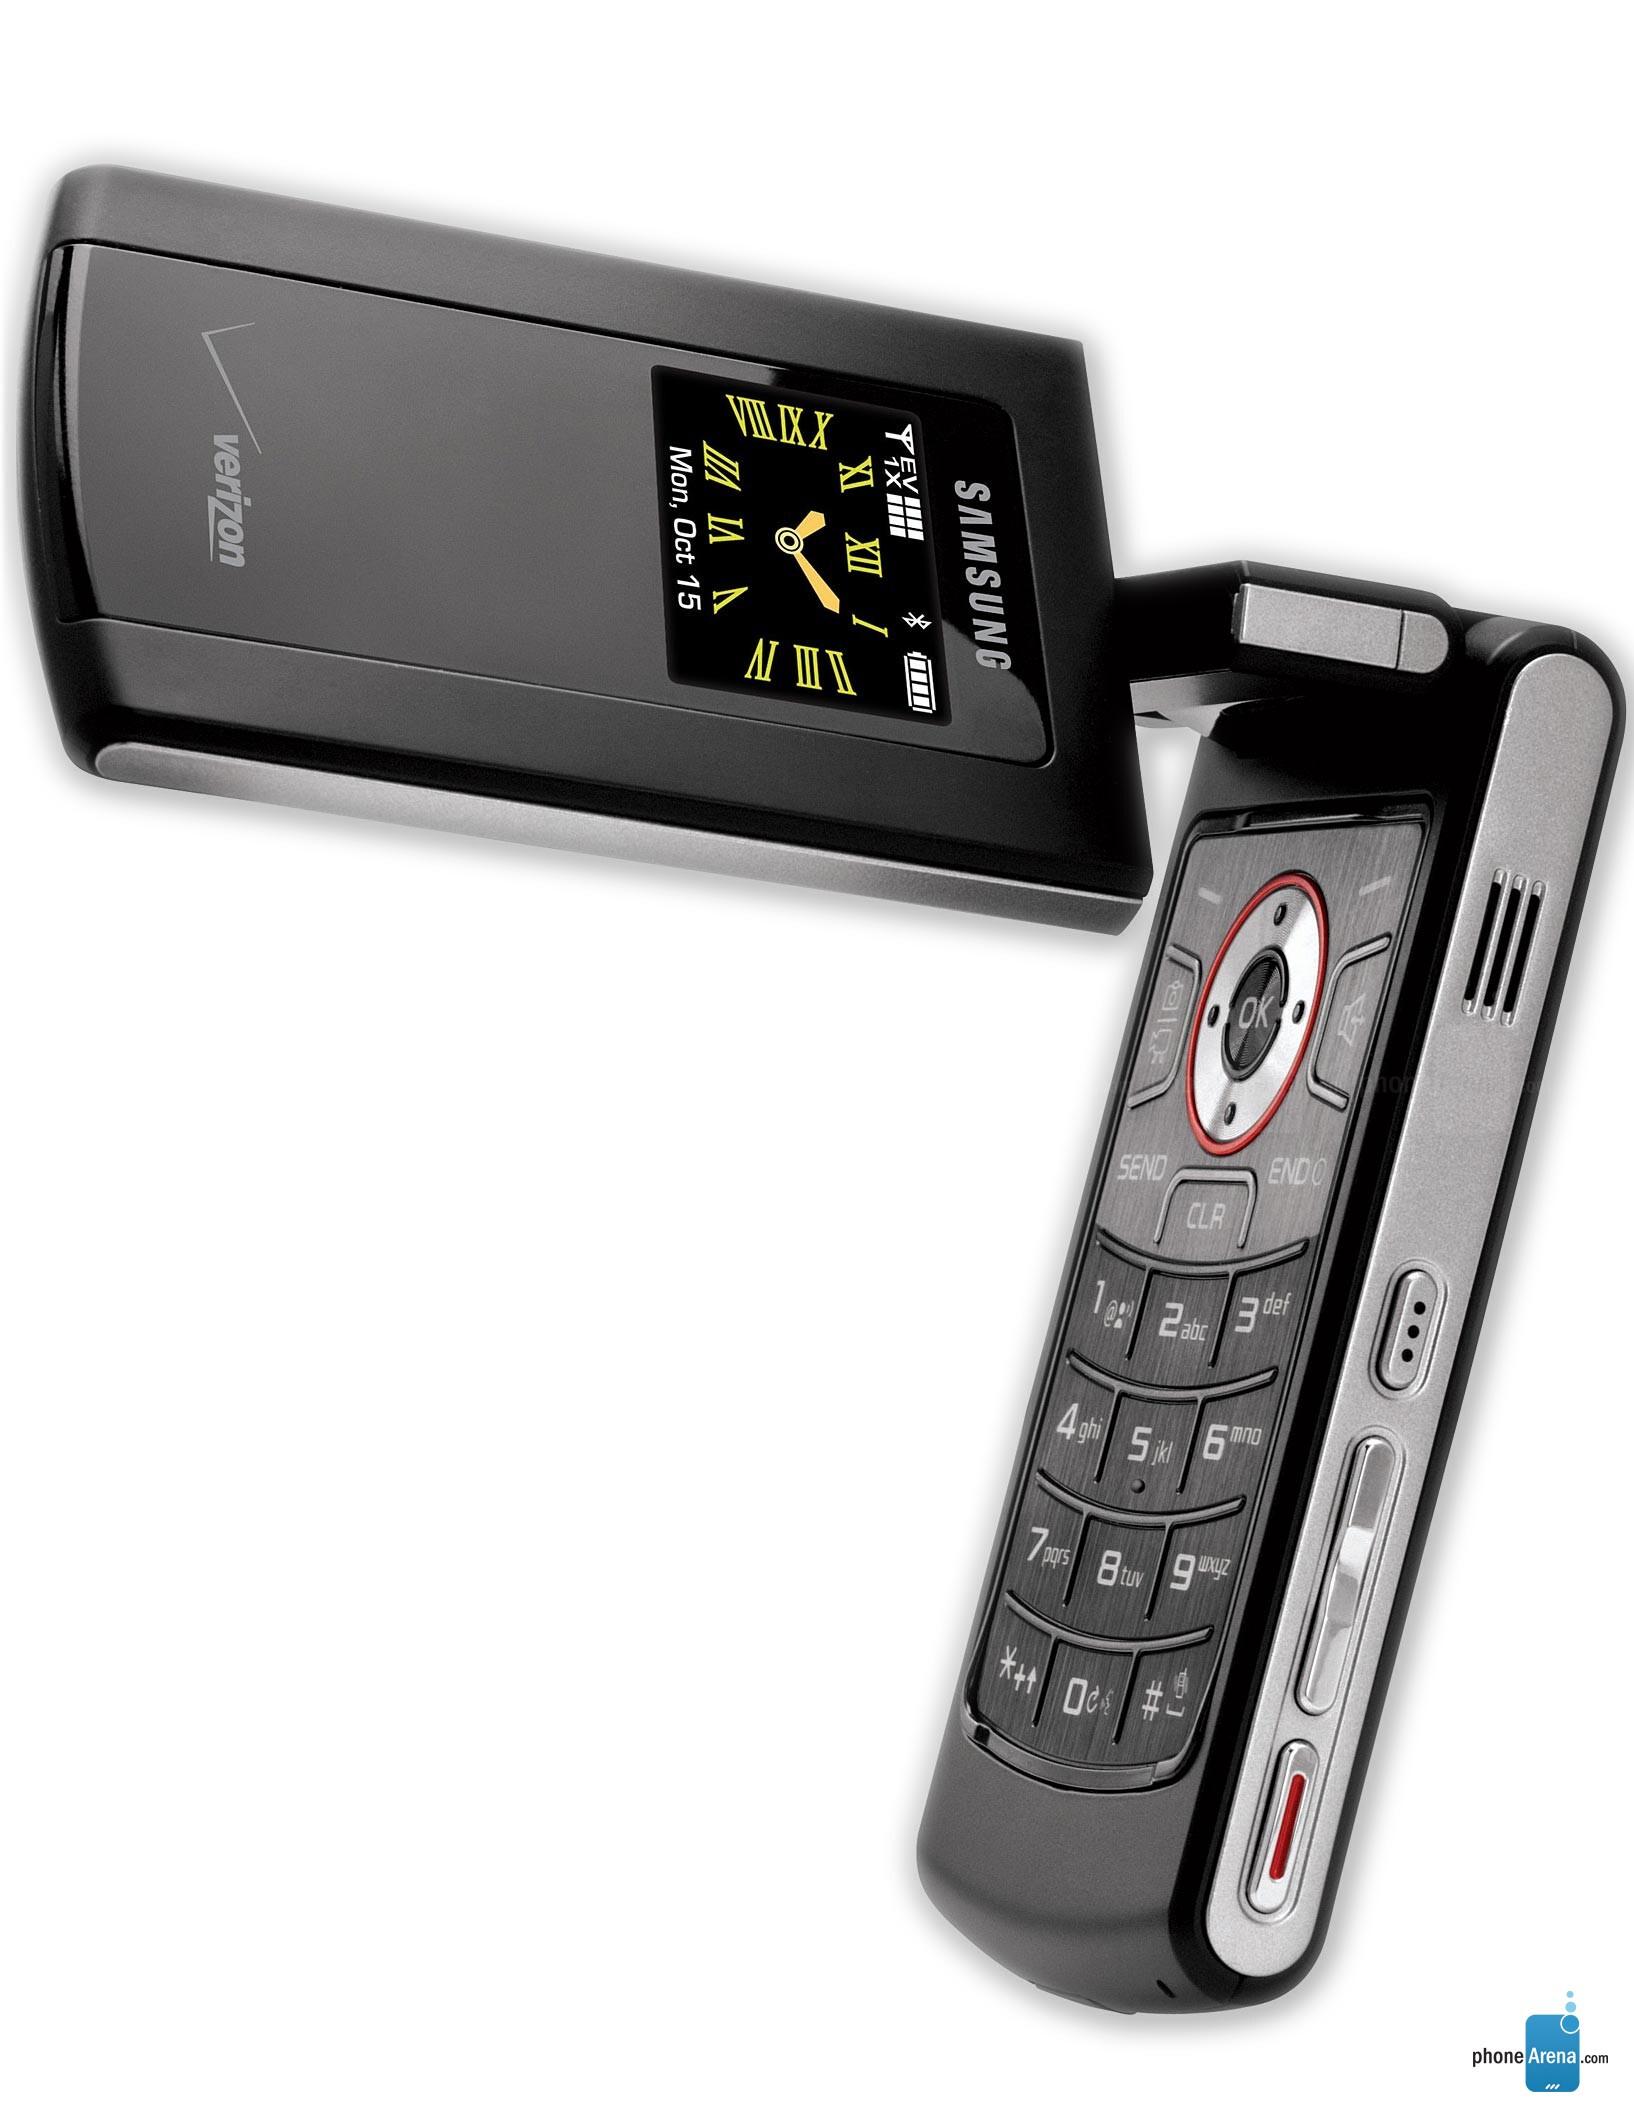 samsung flipshot photos rh phonearena com Samsung Flip Cell Phones Talking samsung u900 flipshot manual